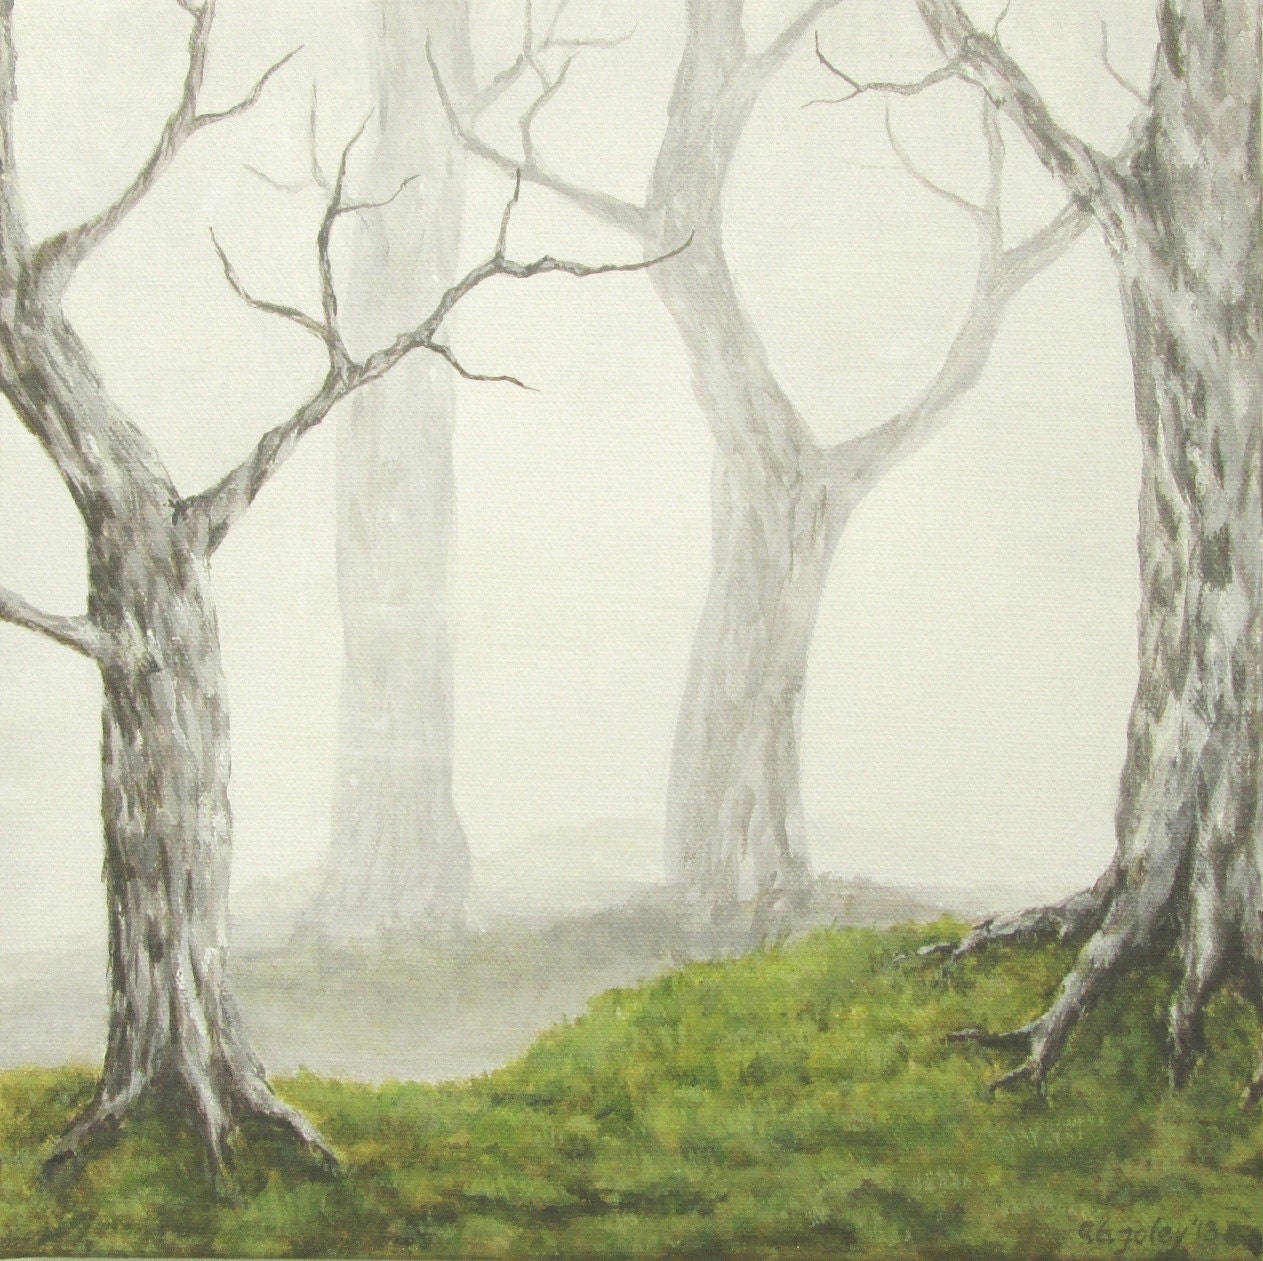 Acrylic Painting Video On Creating Mist